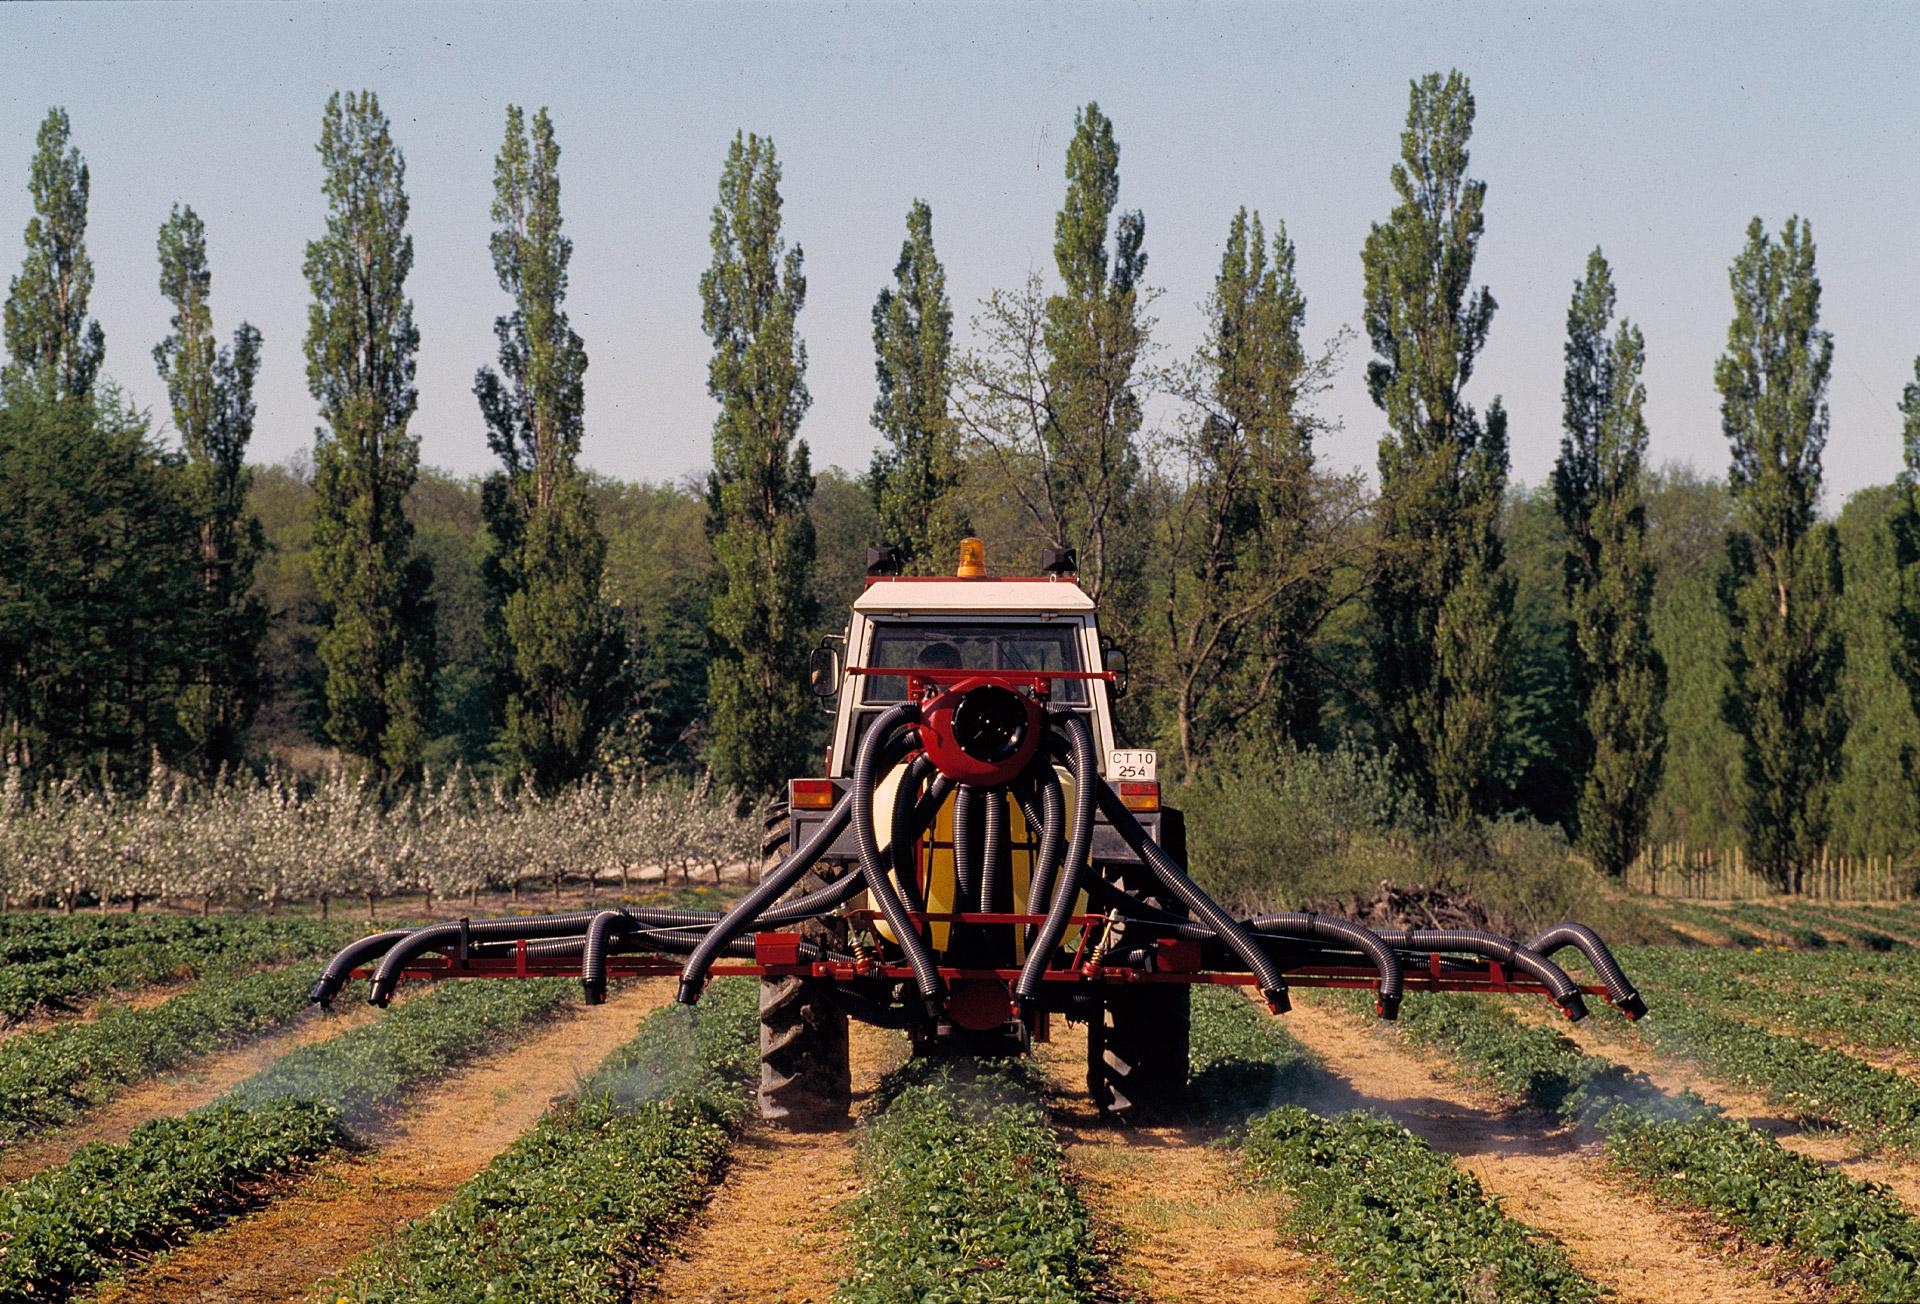 Pesticides are being sprinkled onto strawberries. Hardi International